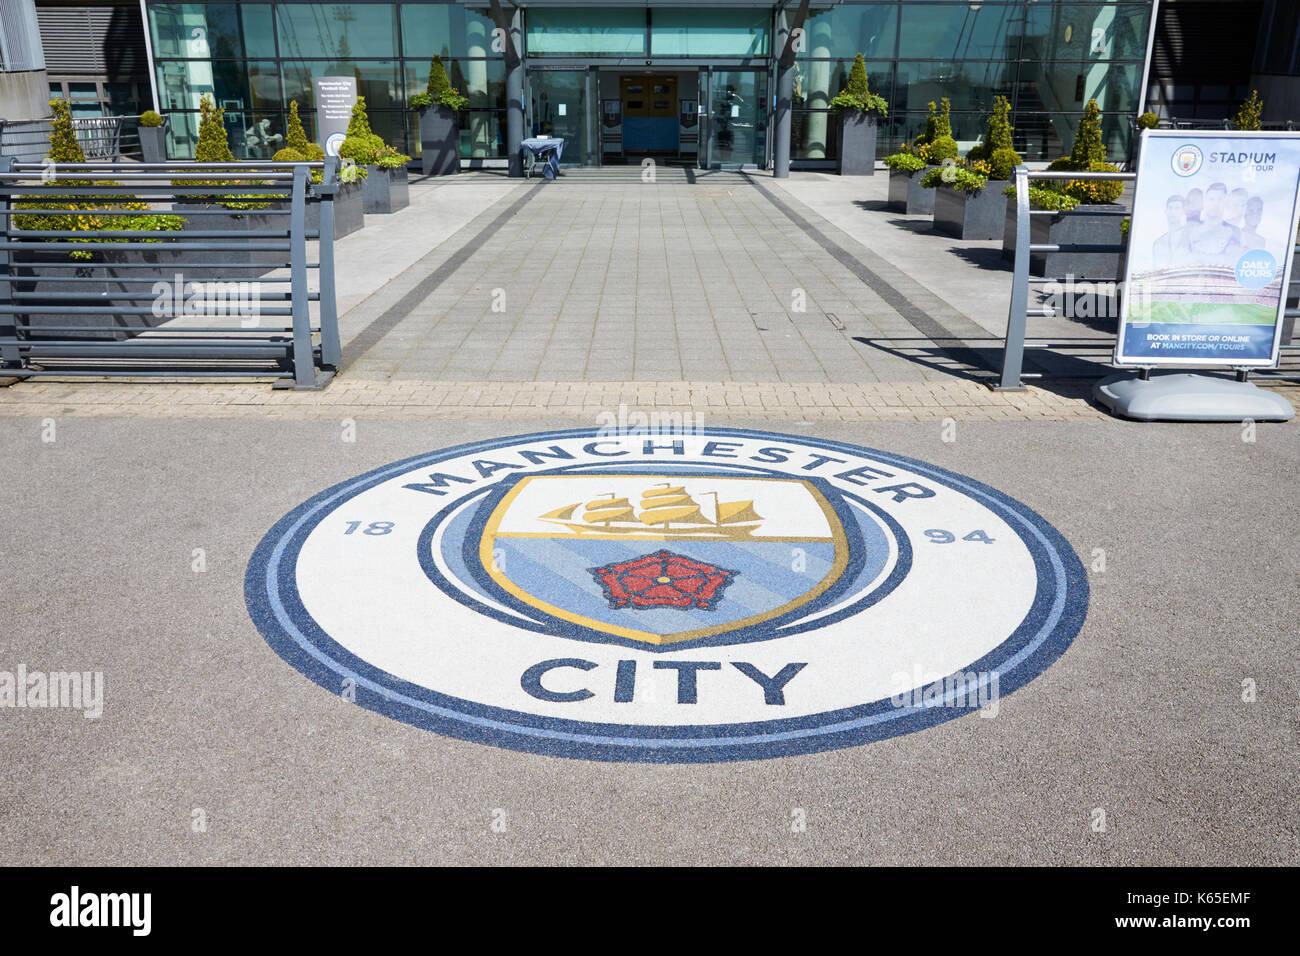 Manchester, UK - 4 May 2017: Club Badge Outside Manchester City Football Stadium - Stock Image